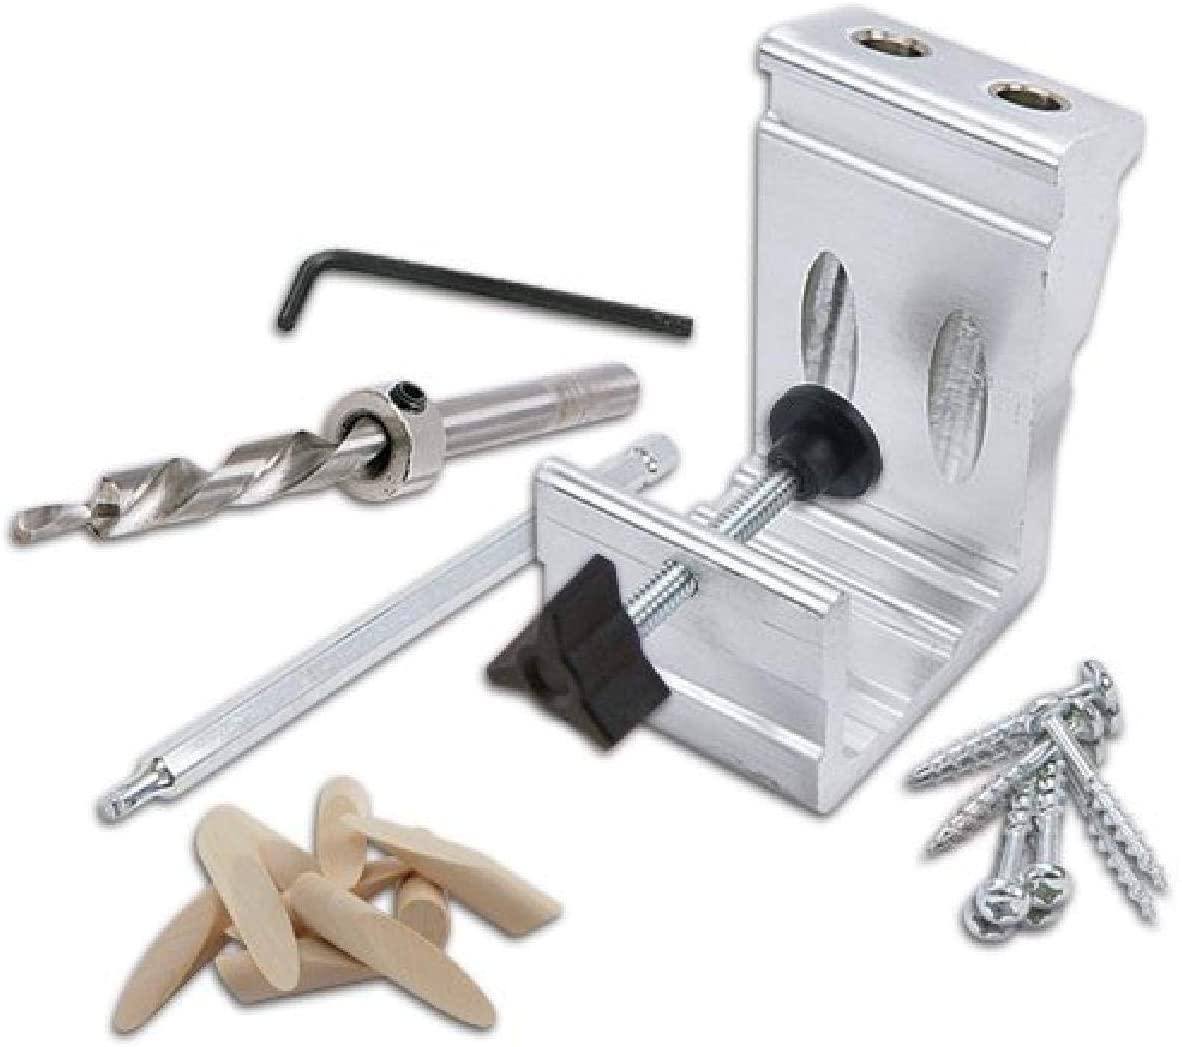 General Tools 850 Heavy Pocket Hole Jig Kit 